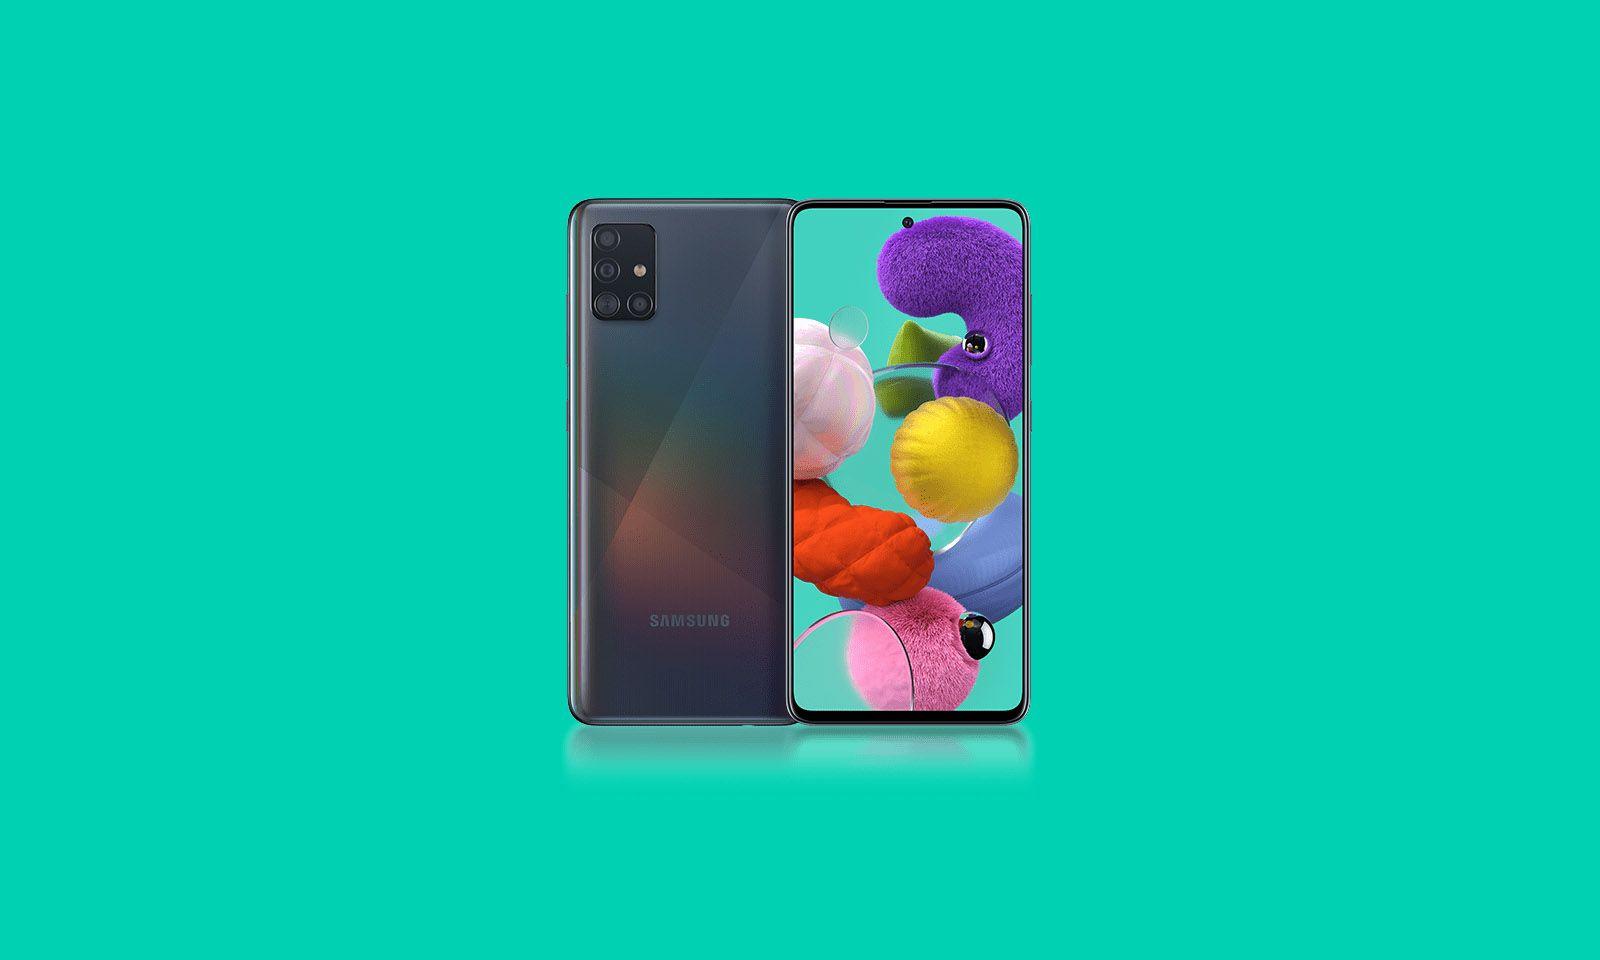 Galaxy A51: Classy, Terjangkau, dan Efisien